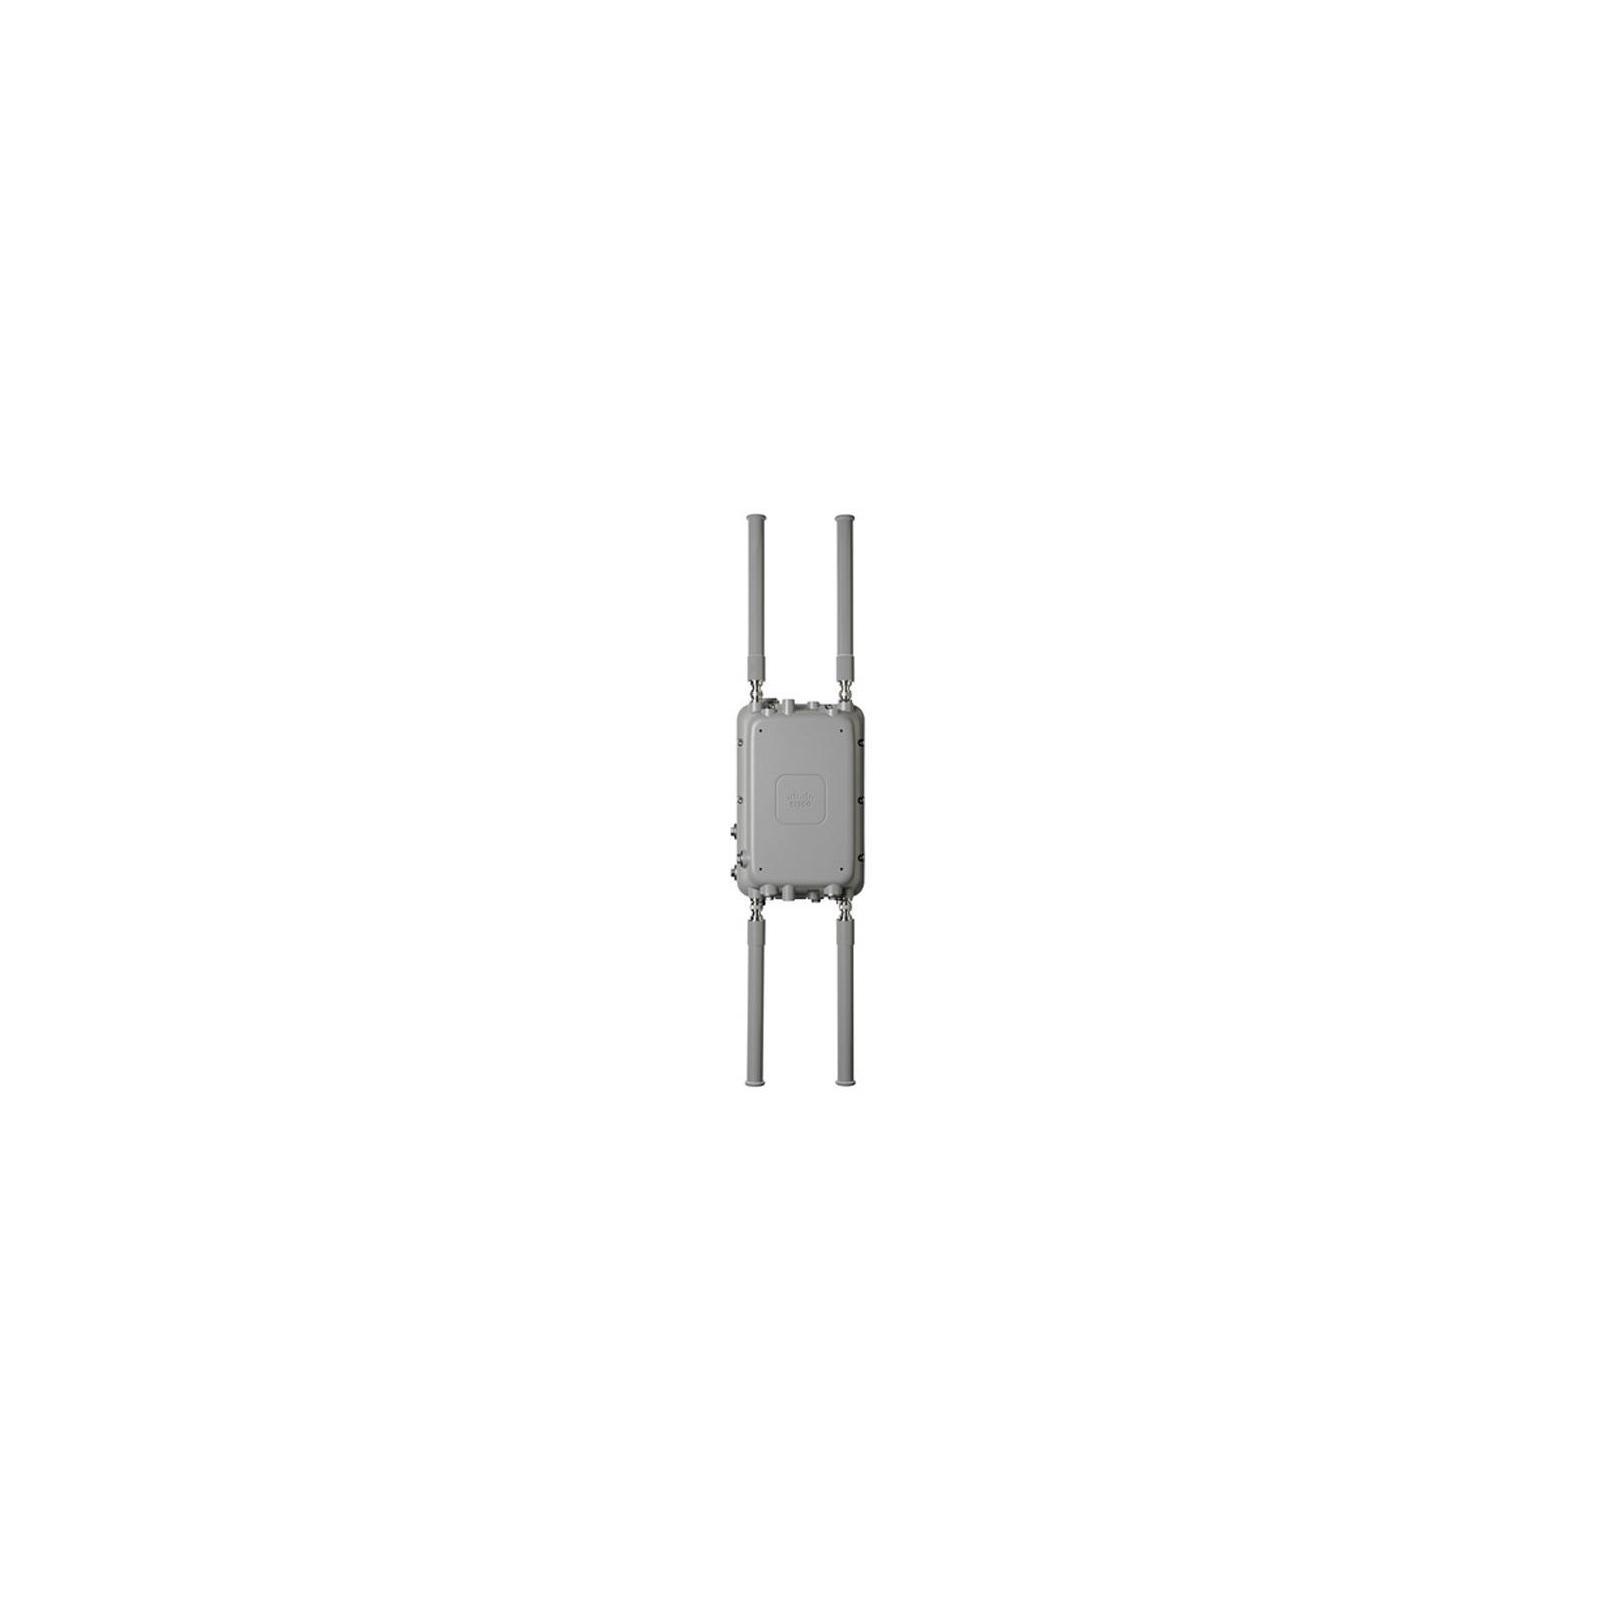 Точка доступа Wi-Fi Cisco AIR-AP1572EAC-E-K9 изображение 6